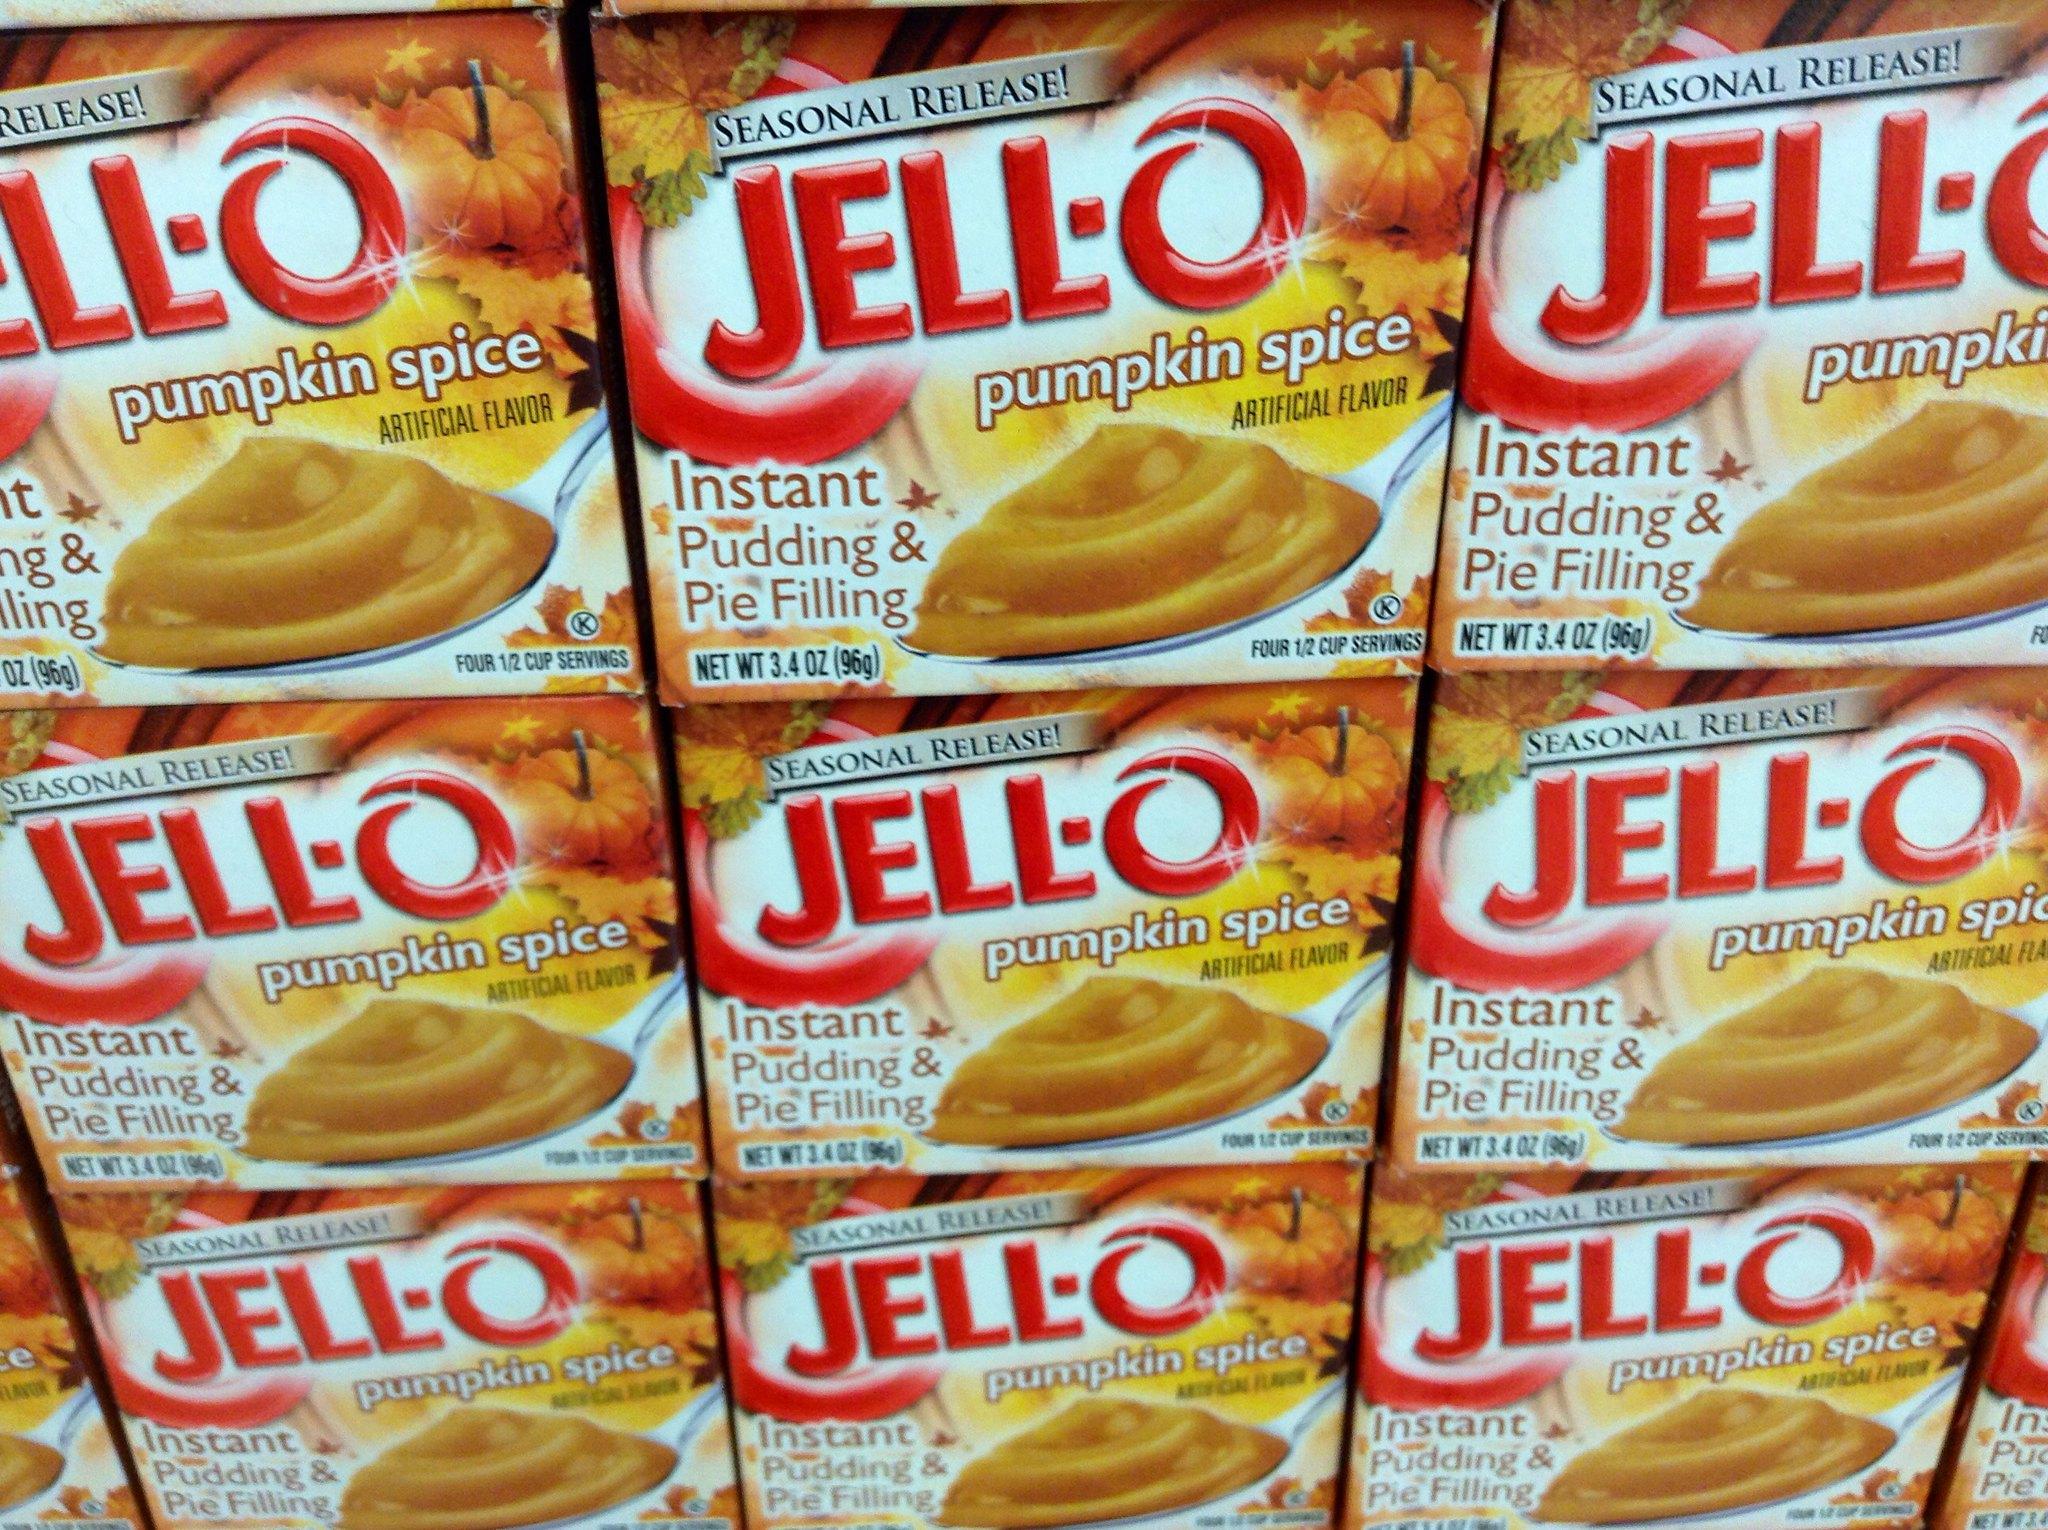 pumpkin spice jell-o packs